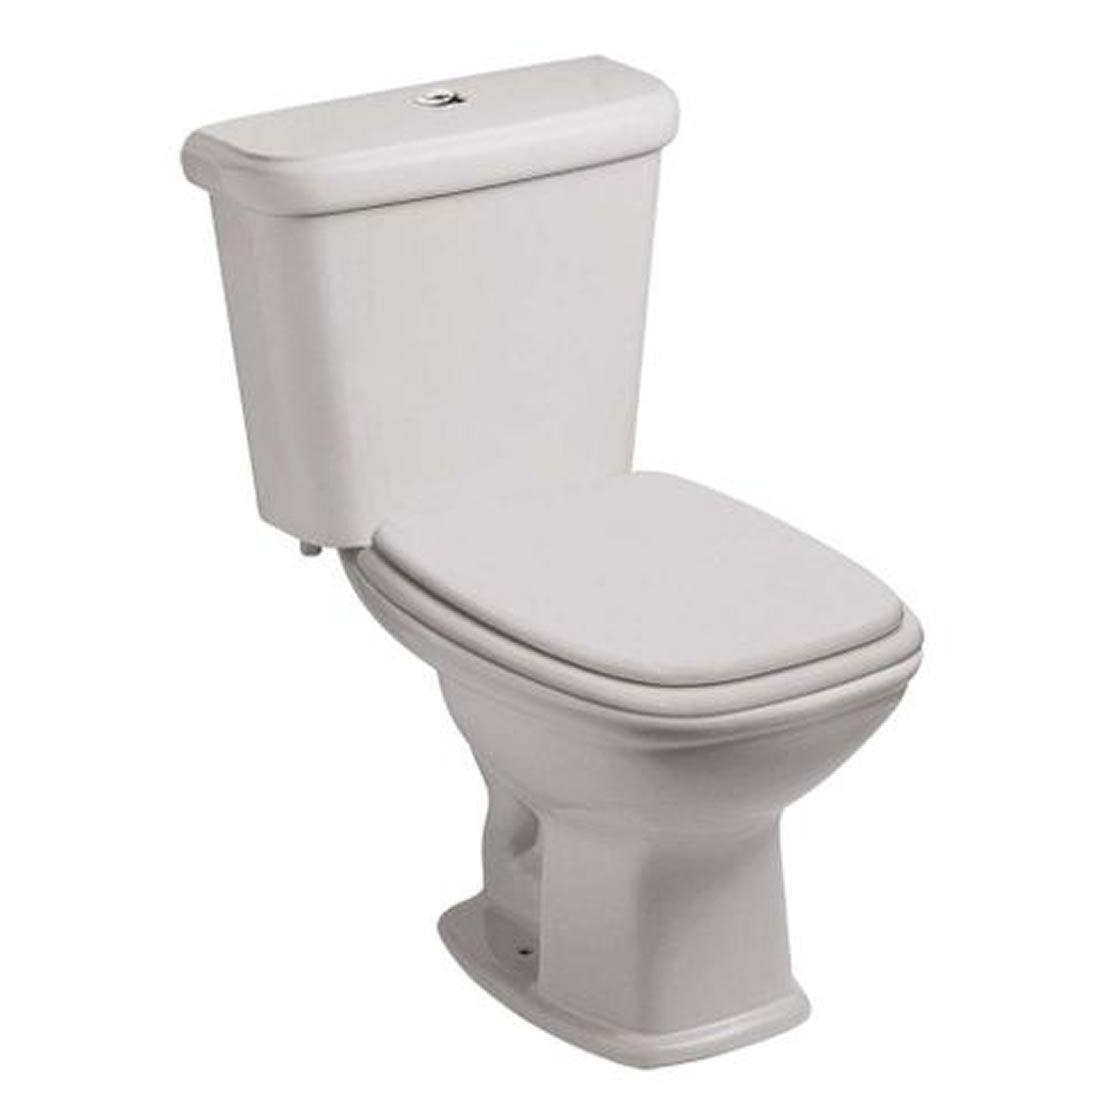 Conjunto Vaso Sanitário com Caixa Acoplada 3/6L Ecoflush Fit Cinza Prata Celite